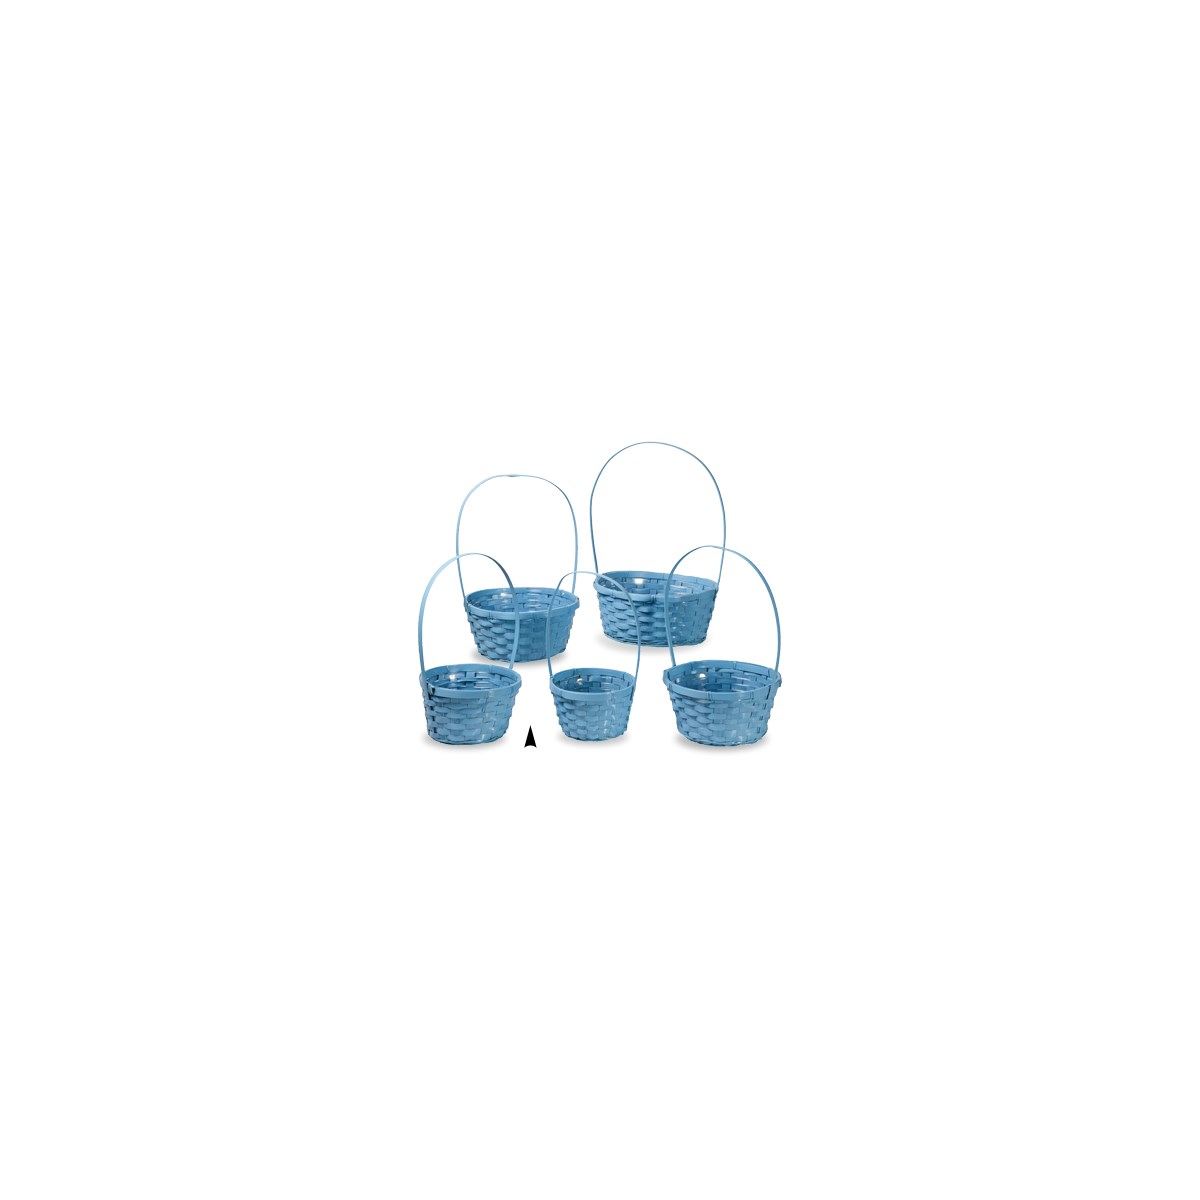 29/11090/B S/5 BLUE ROUND BAMBOO BASKETS W/LINERS CS. PK.: 20